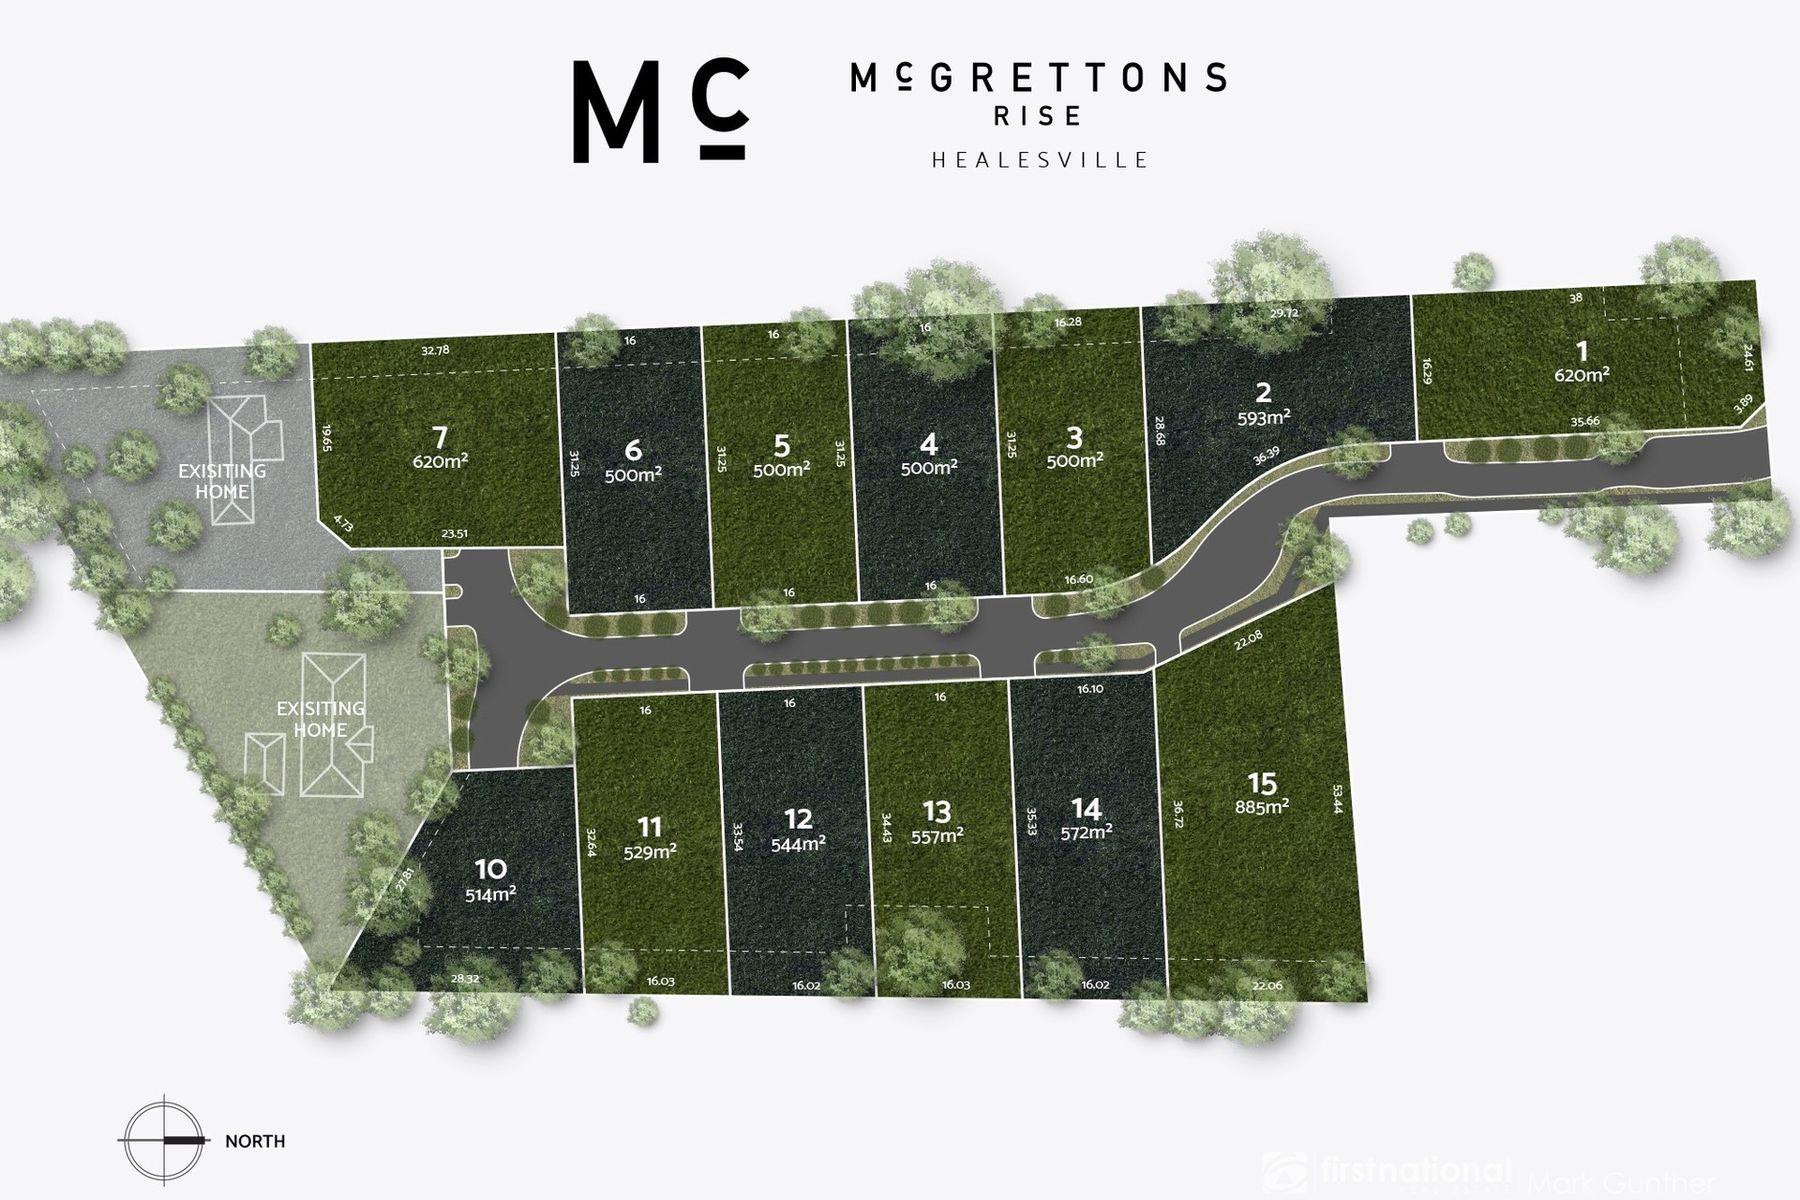 Lot 5/29 Mcgrettons Road, Healesville, VIC 3777